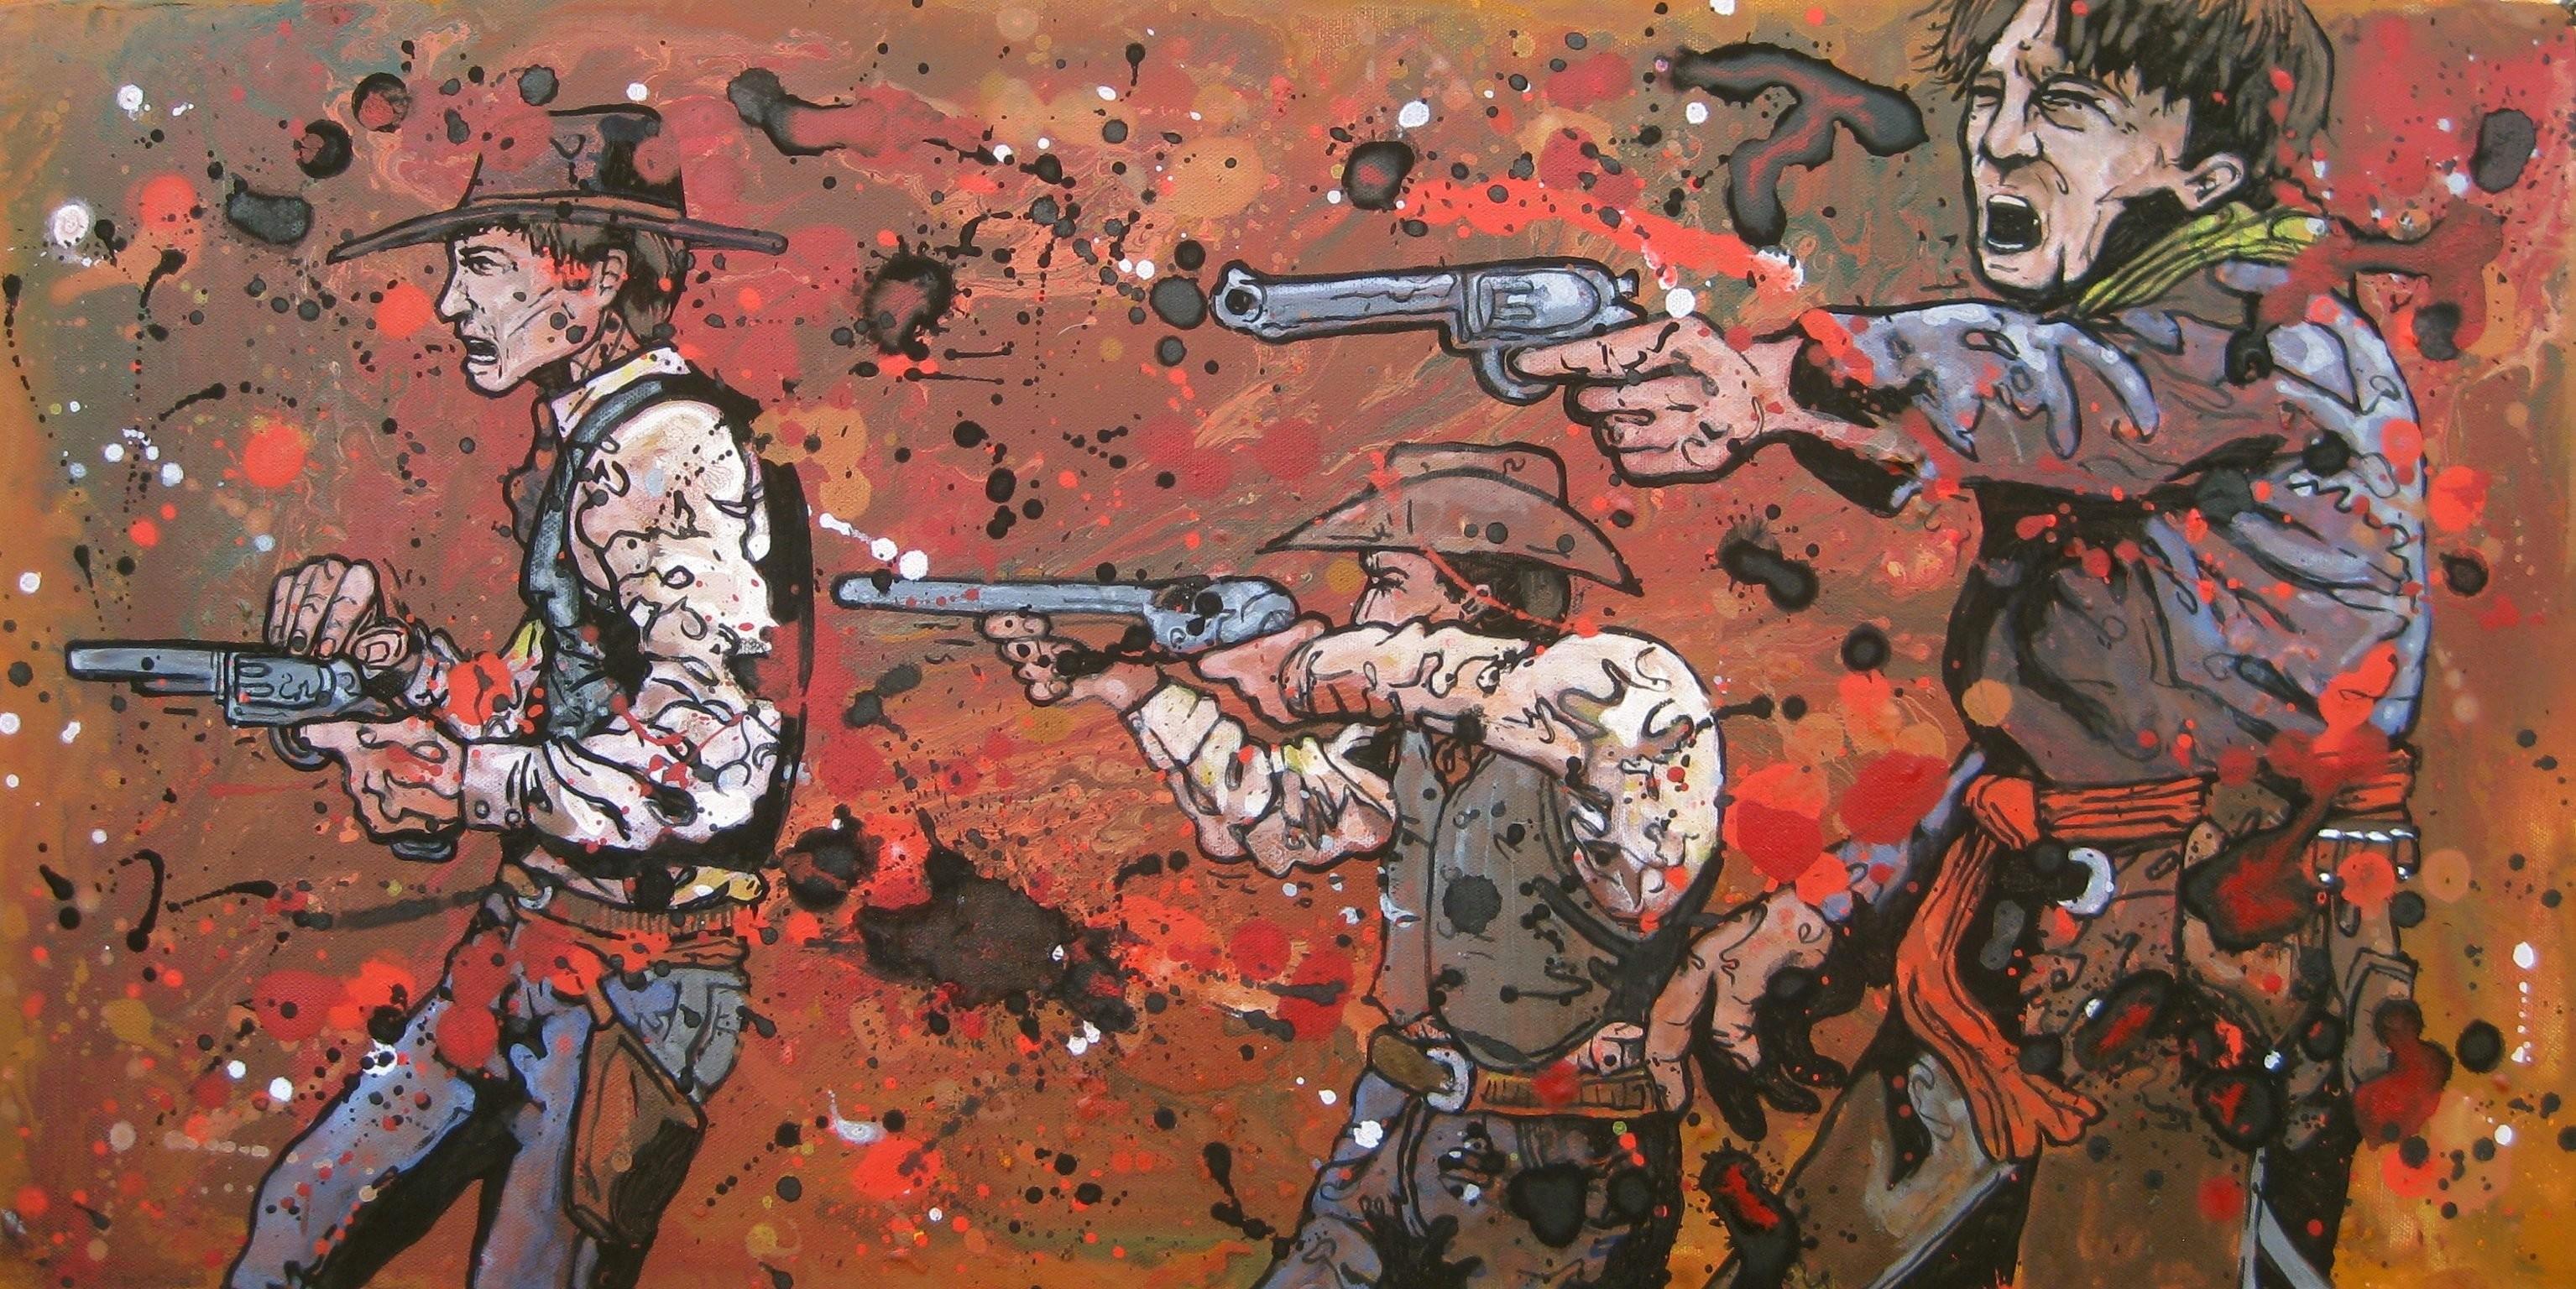 Western Battle Weapon Gun Artwork Cowboy Wallpaper At Dark Wallpapers